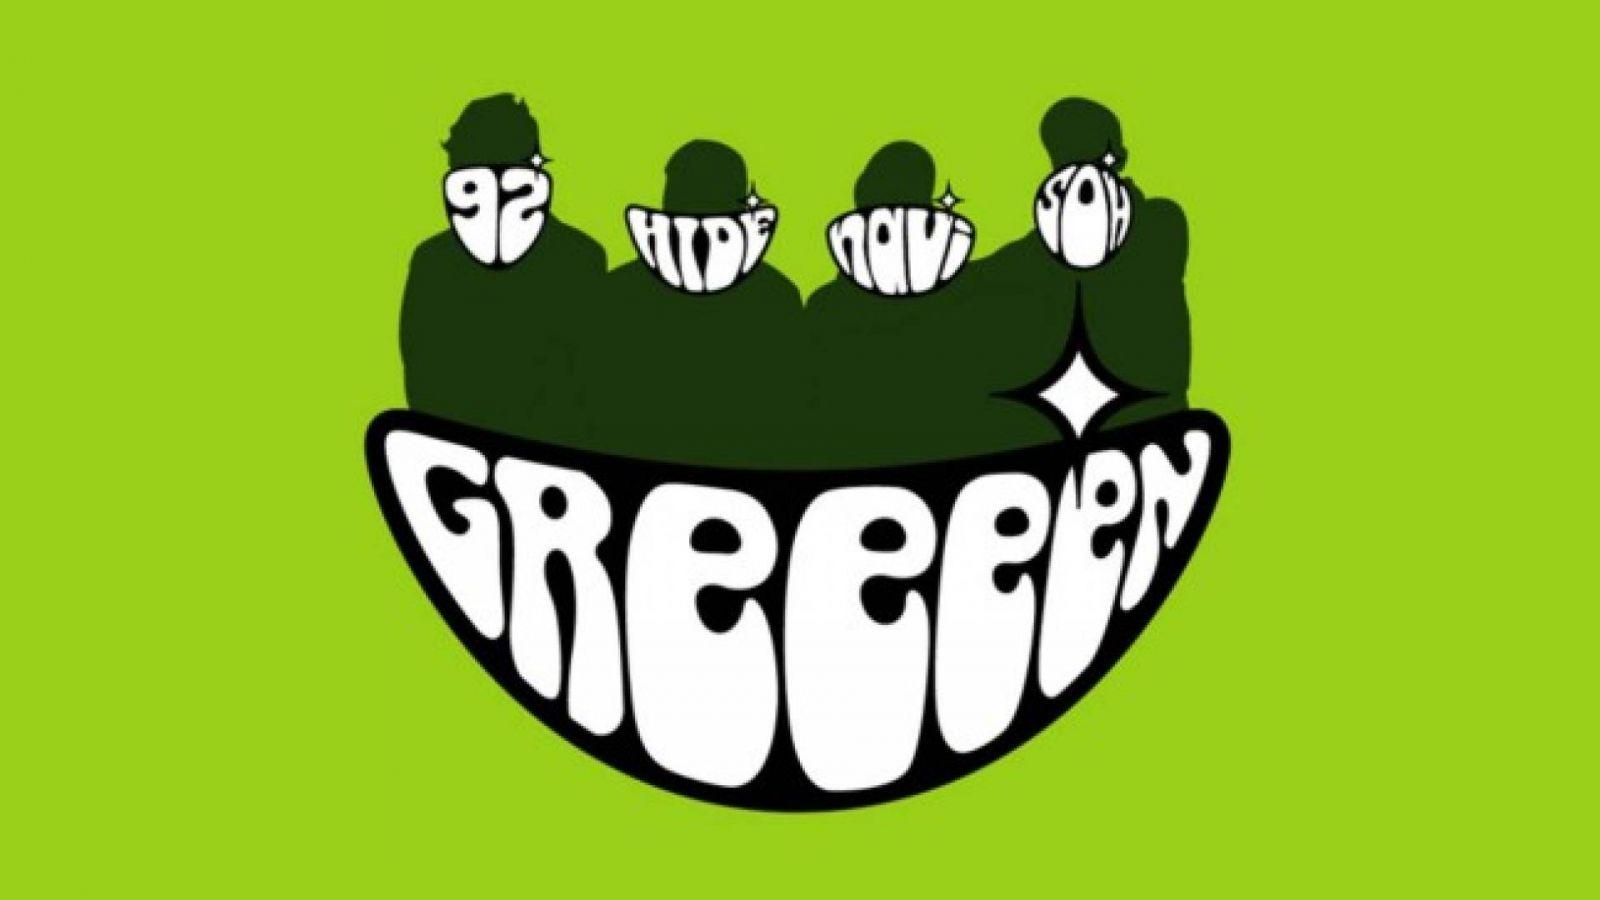 GReeeeN © GReeeeN / Universal Music Japan